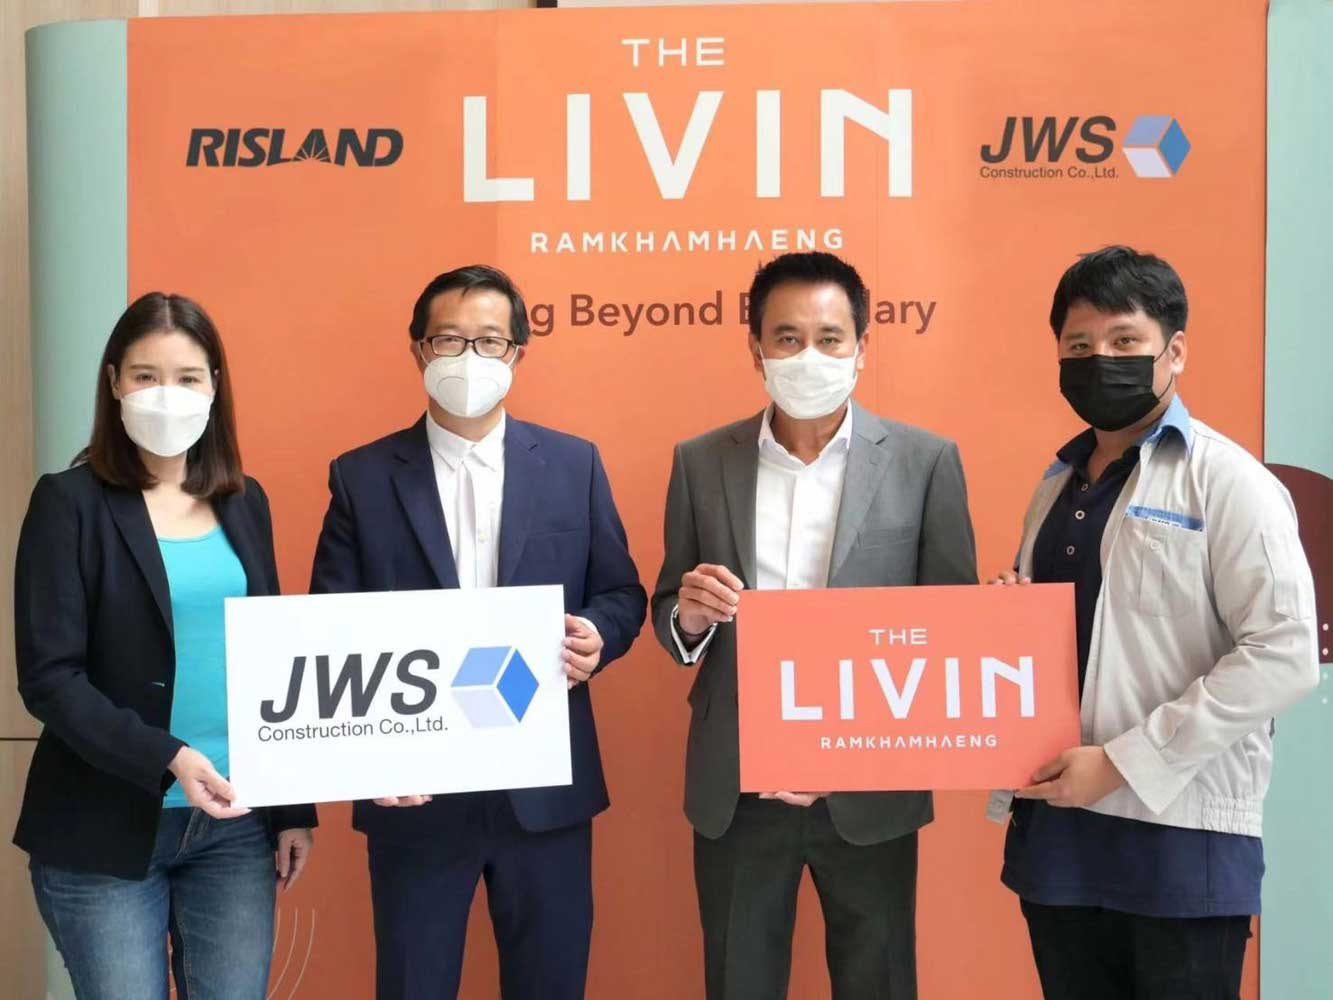 The Livin Ramkhamhaeng appoints JWS as Main Contractor